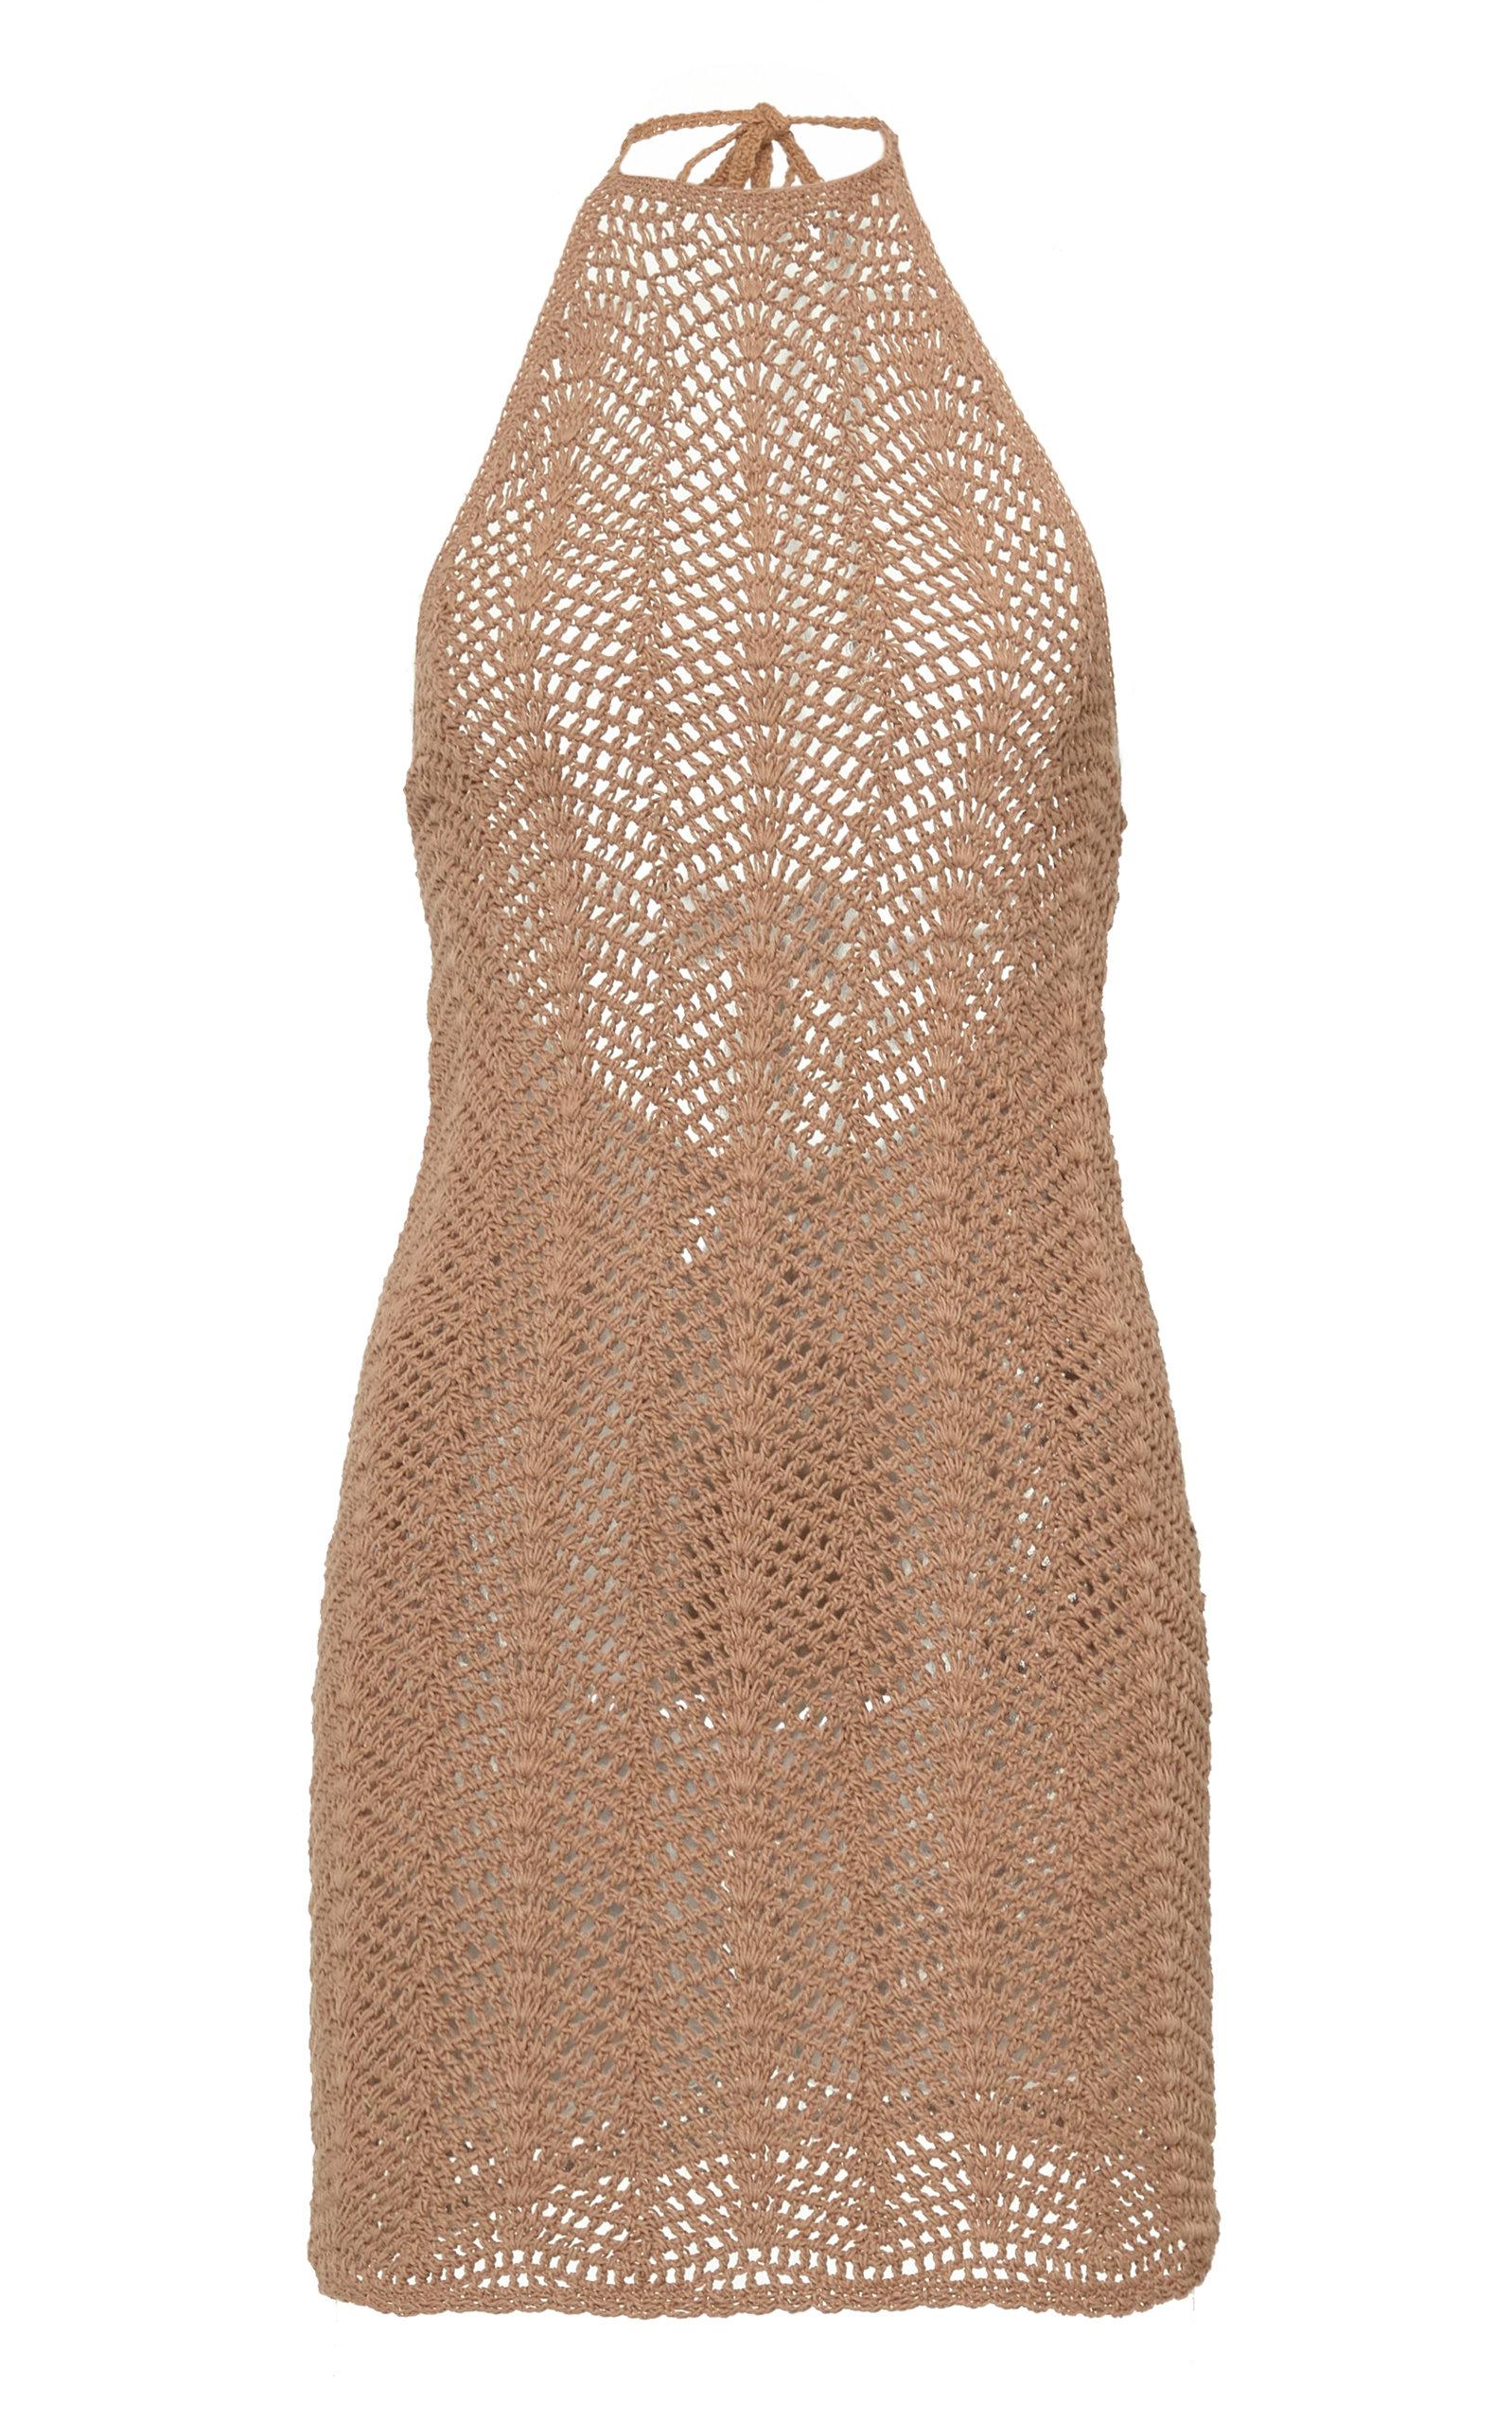 Buy Akoia Swim Noelie Crocheted Cotton Halterneck Mini Dress online, shop Akoia Swim at the best price